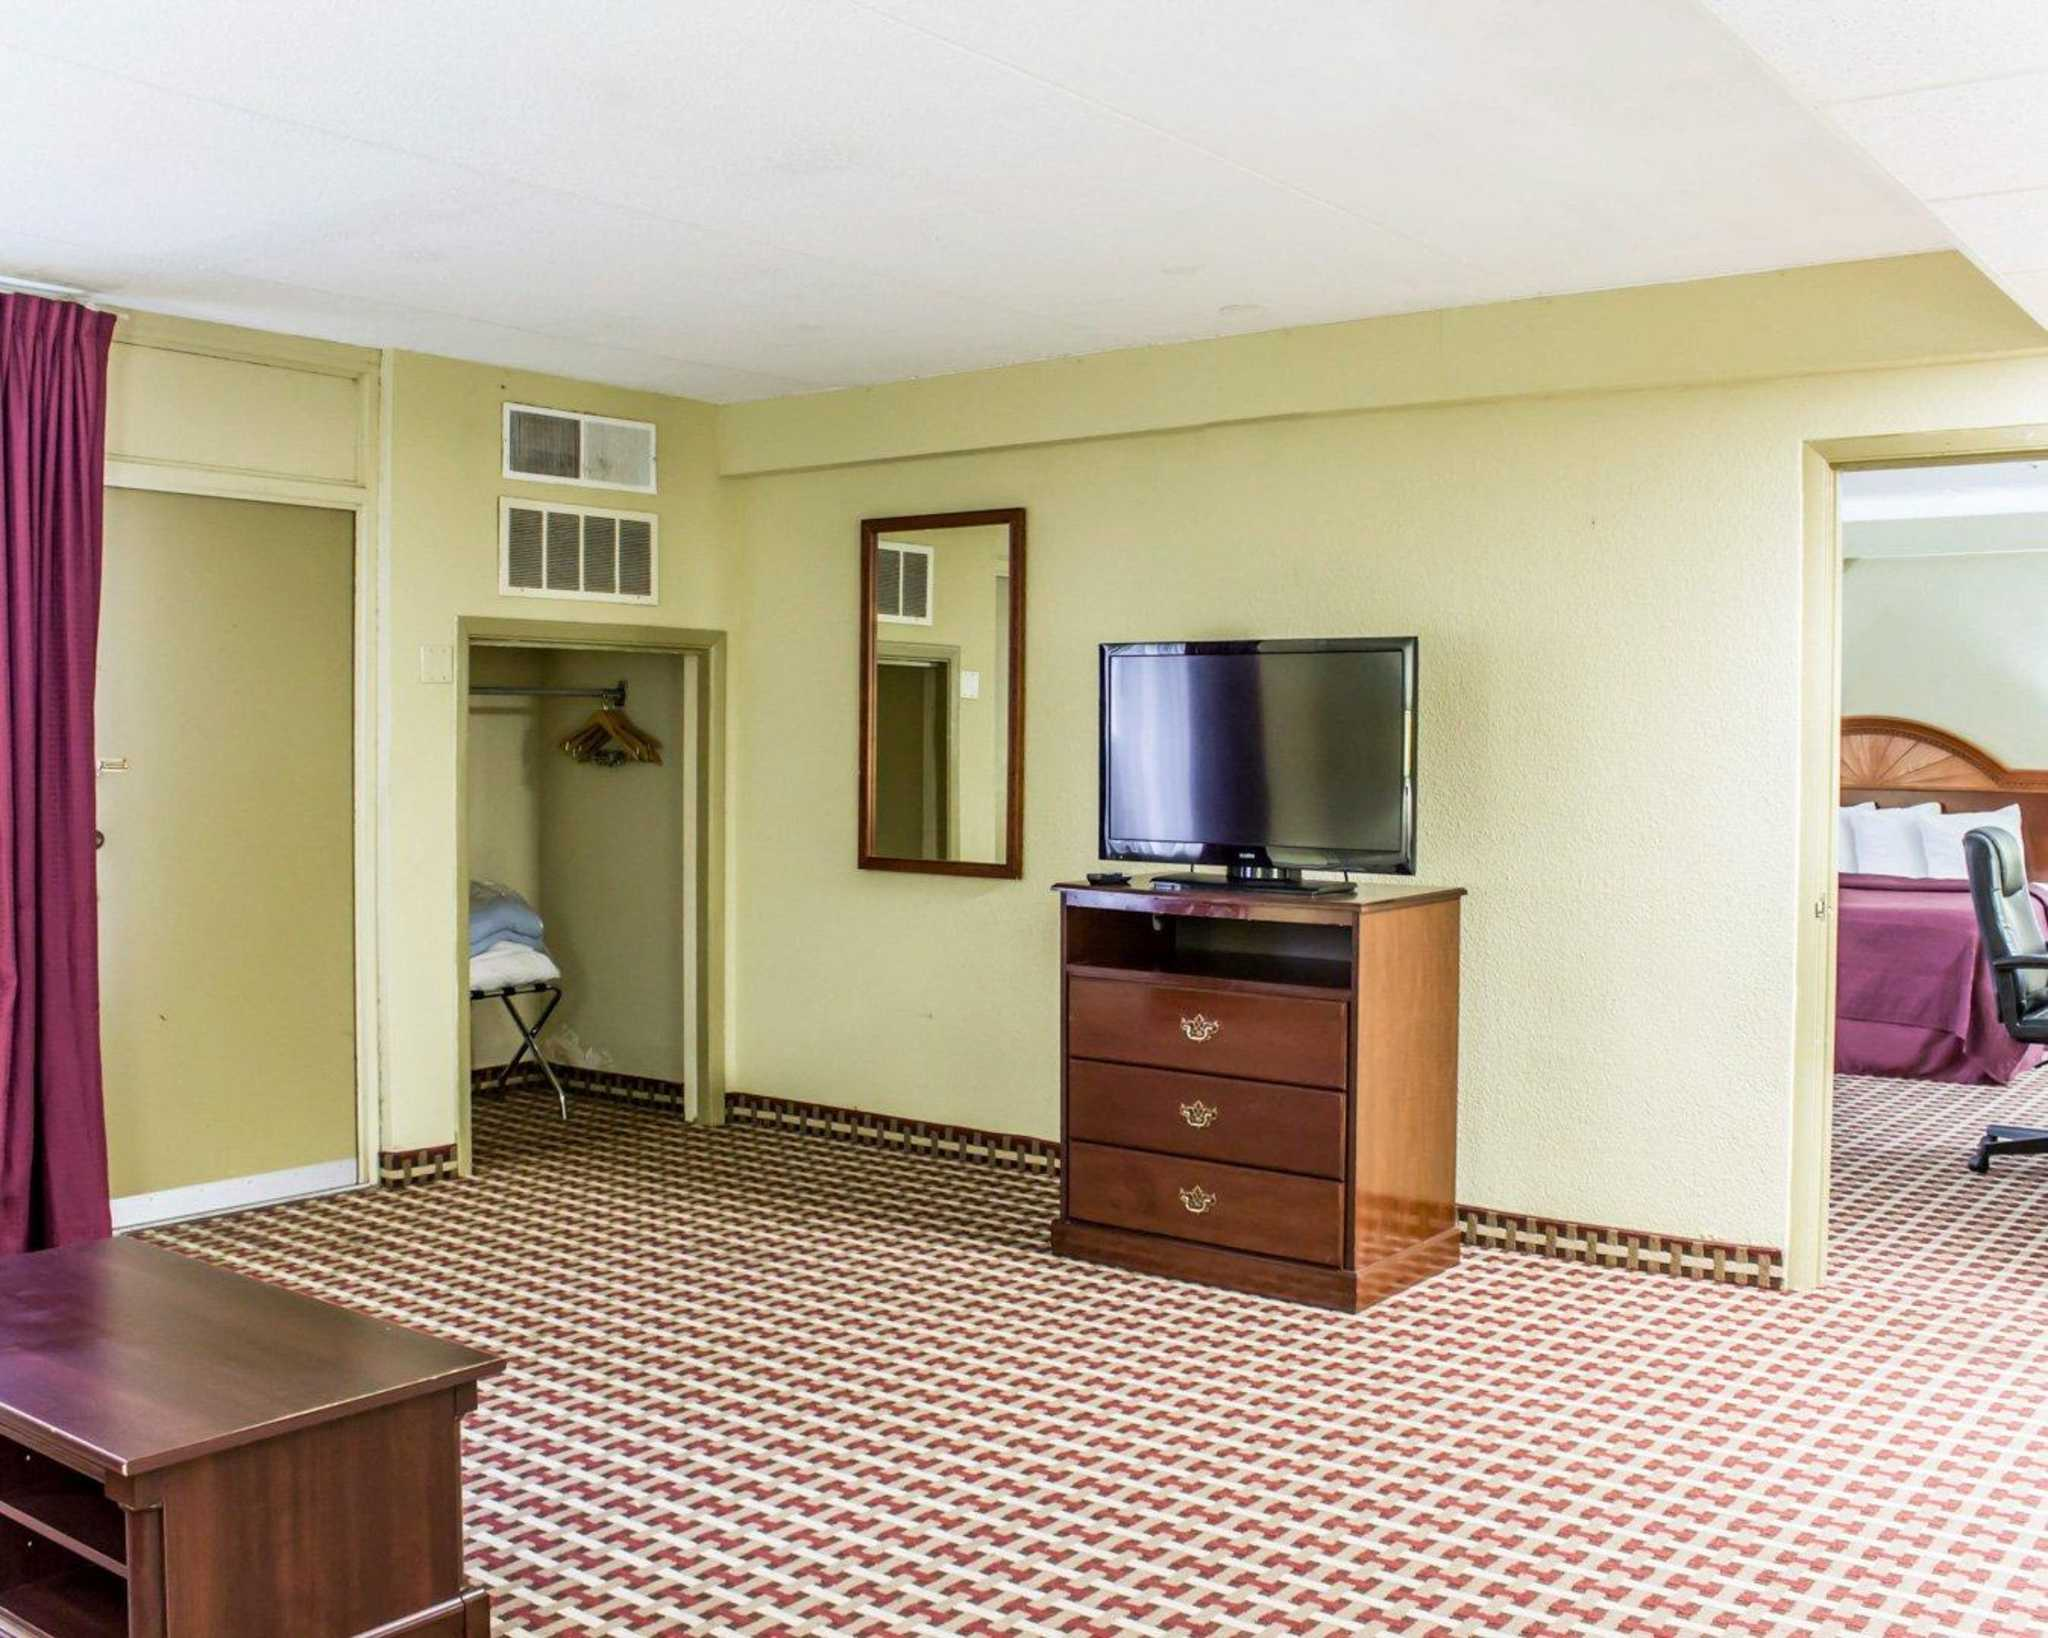 Quality Inn & Suites Fort Bragg image 21